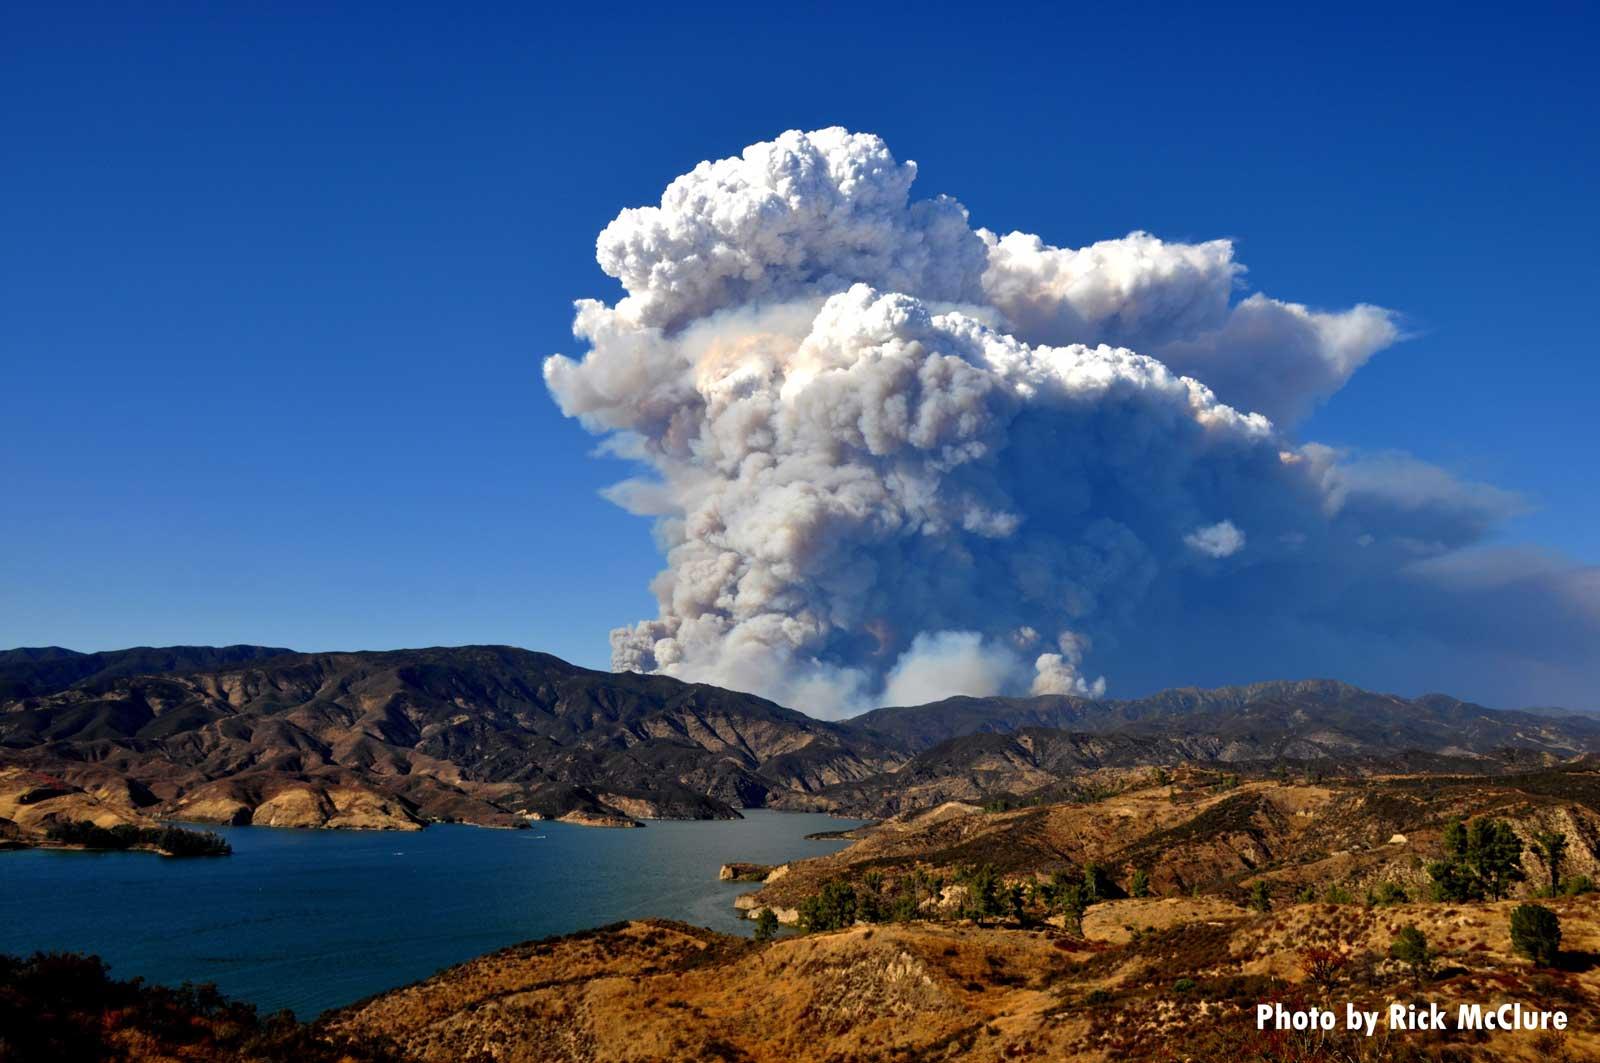 Wildland fire near Lake Hughes